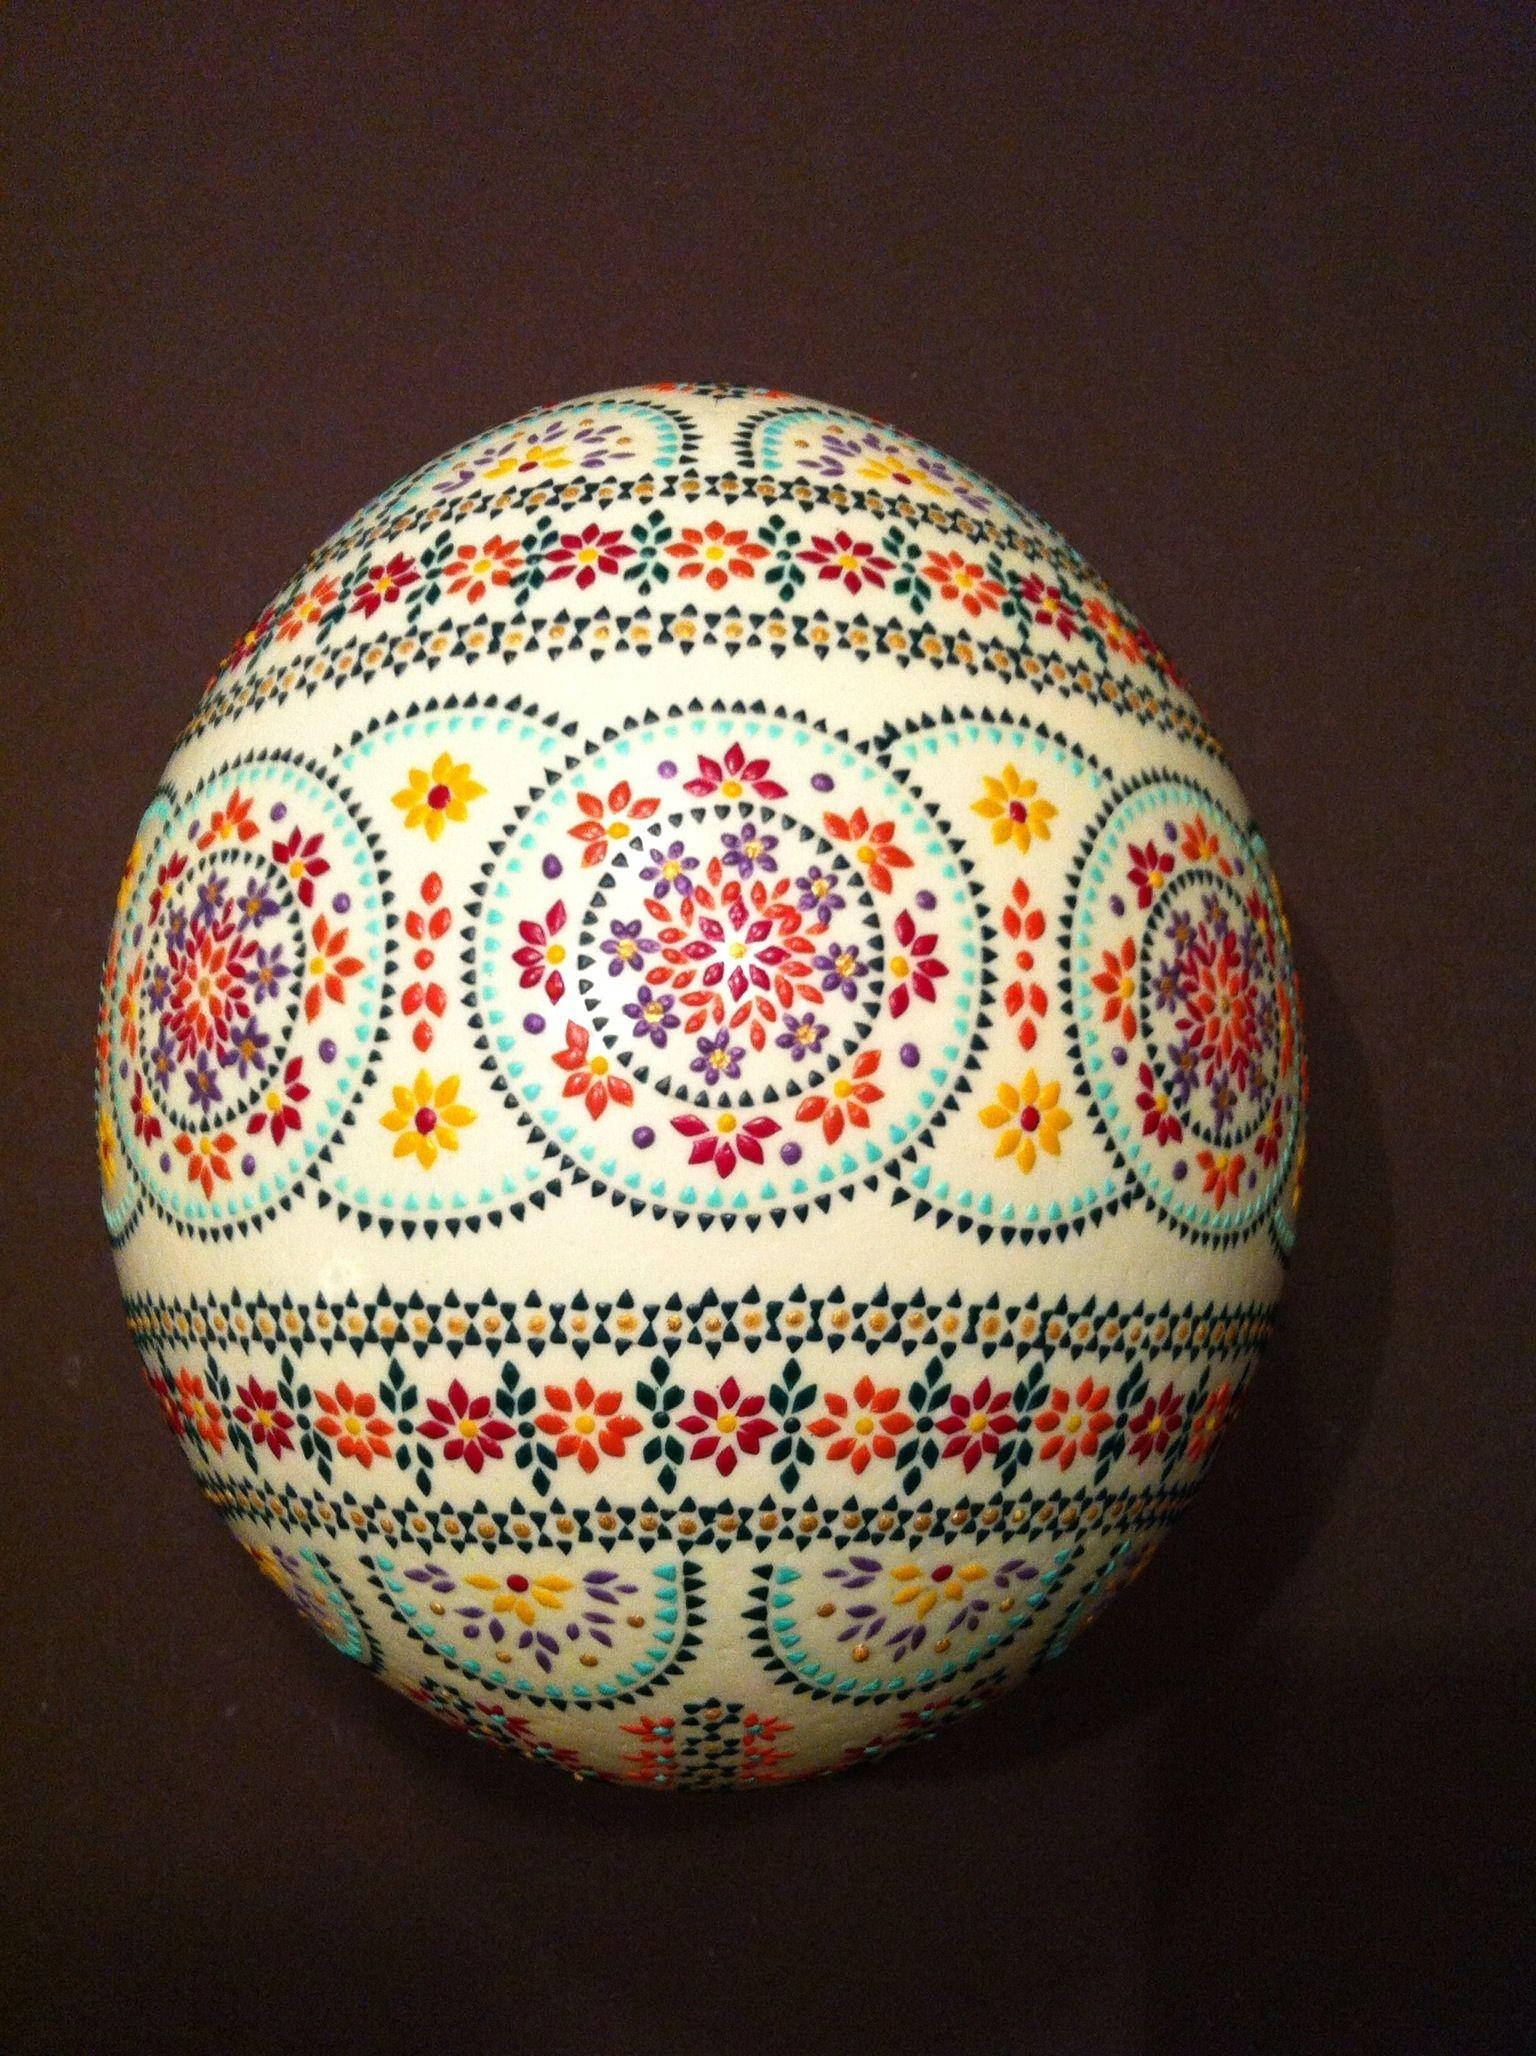 sorbische ostereier sorbian easter eggs wachsart. Black Bedroom Furniture Sets. Home Design Ideas